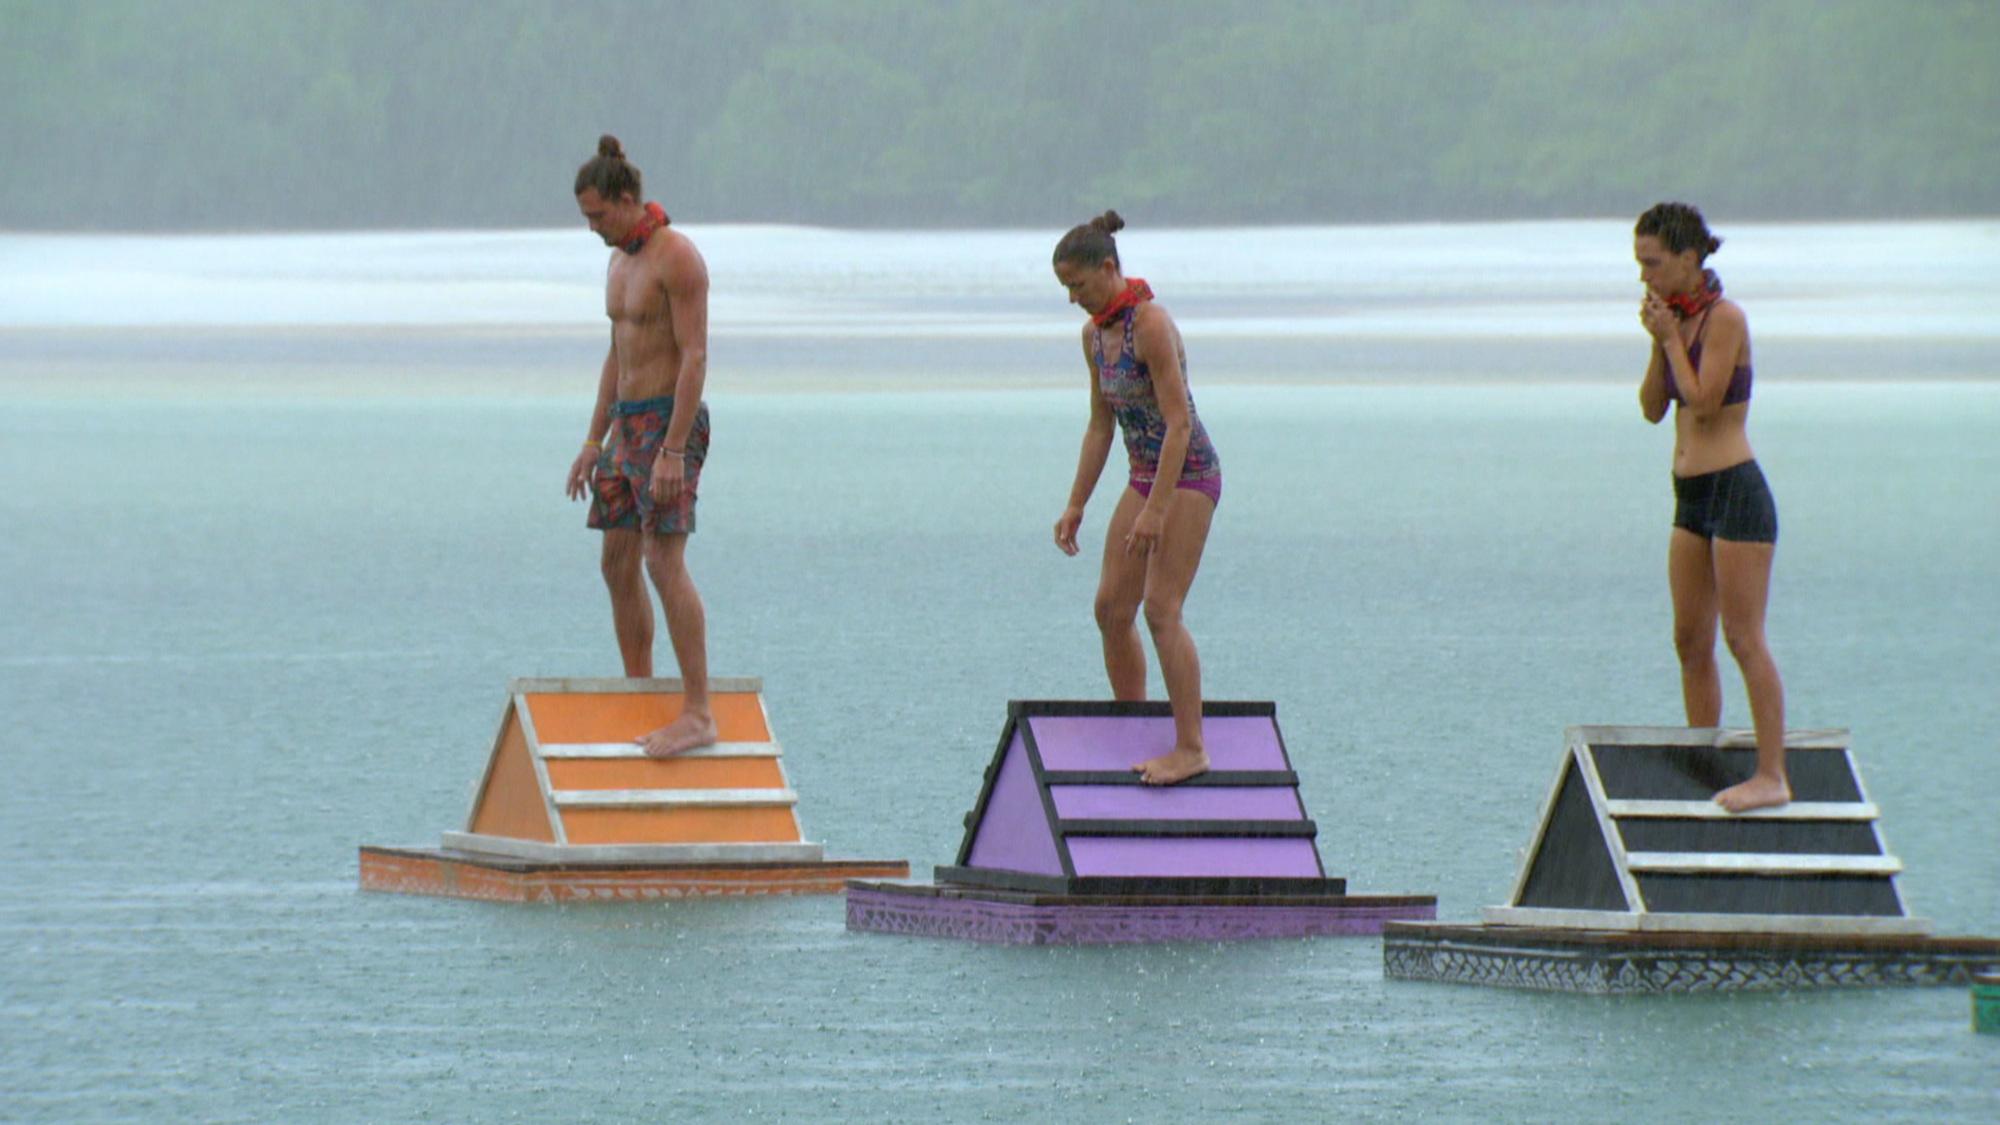 Joe Anglim, Kelly Wiglesworth and Abi-Maria Gomes compete in Survivor: Second Chance challenge